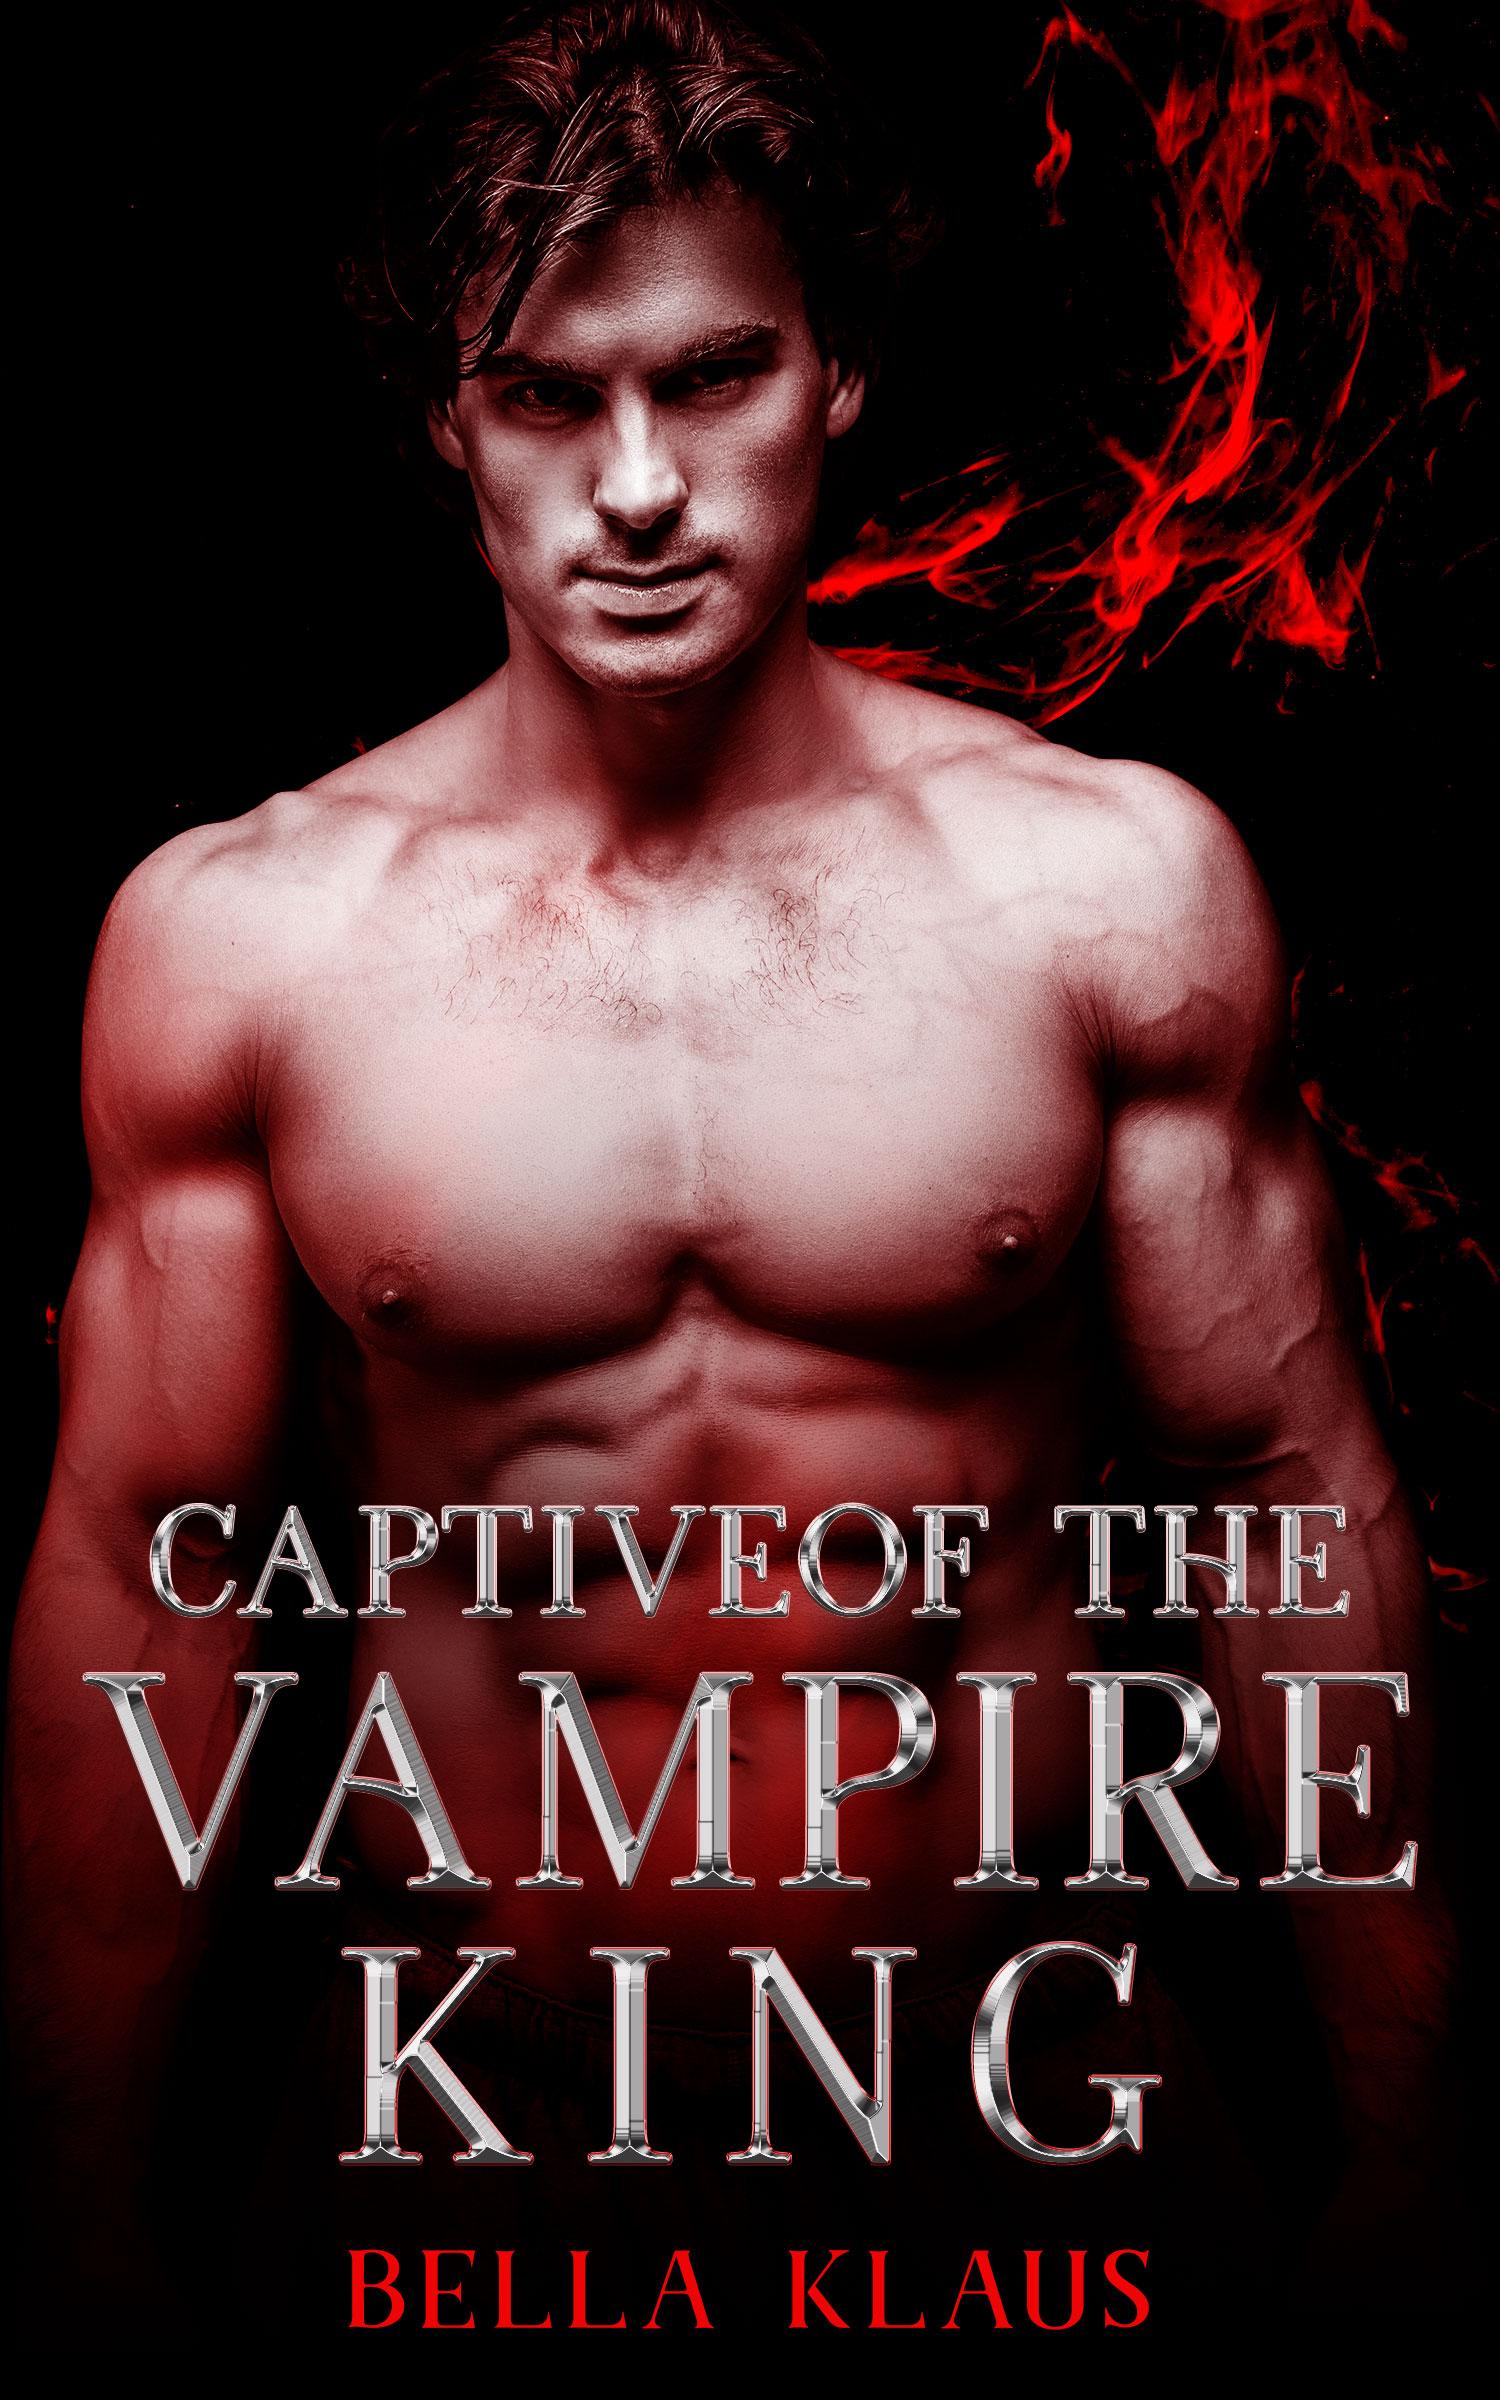 Captive of the Vampire King